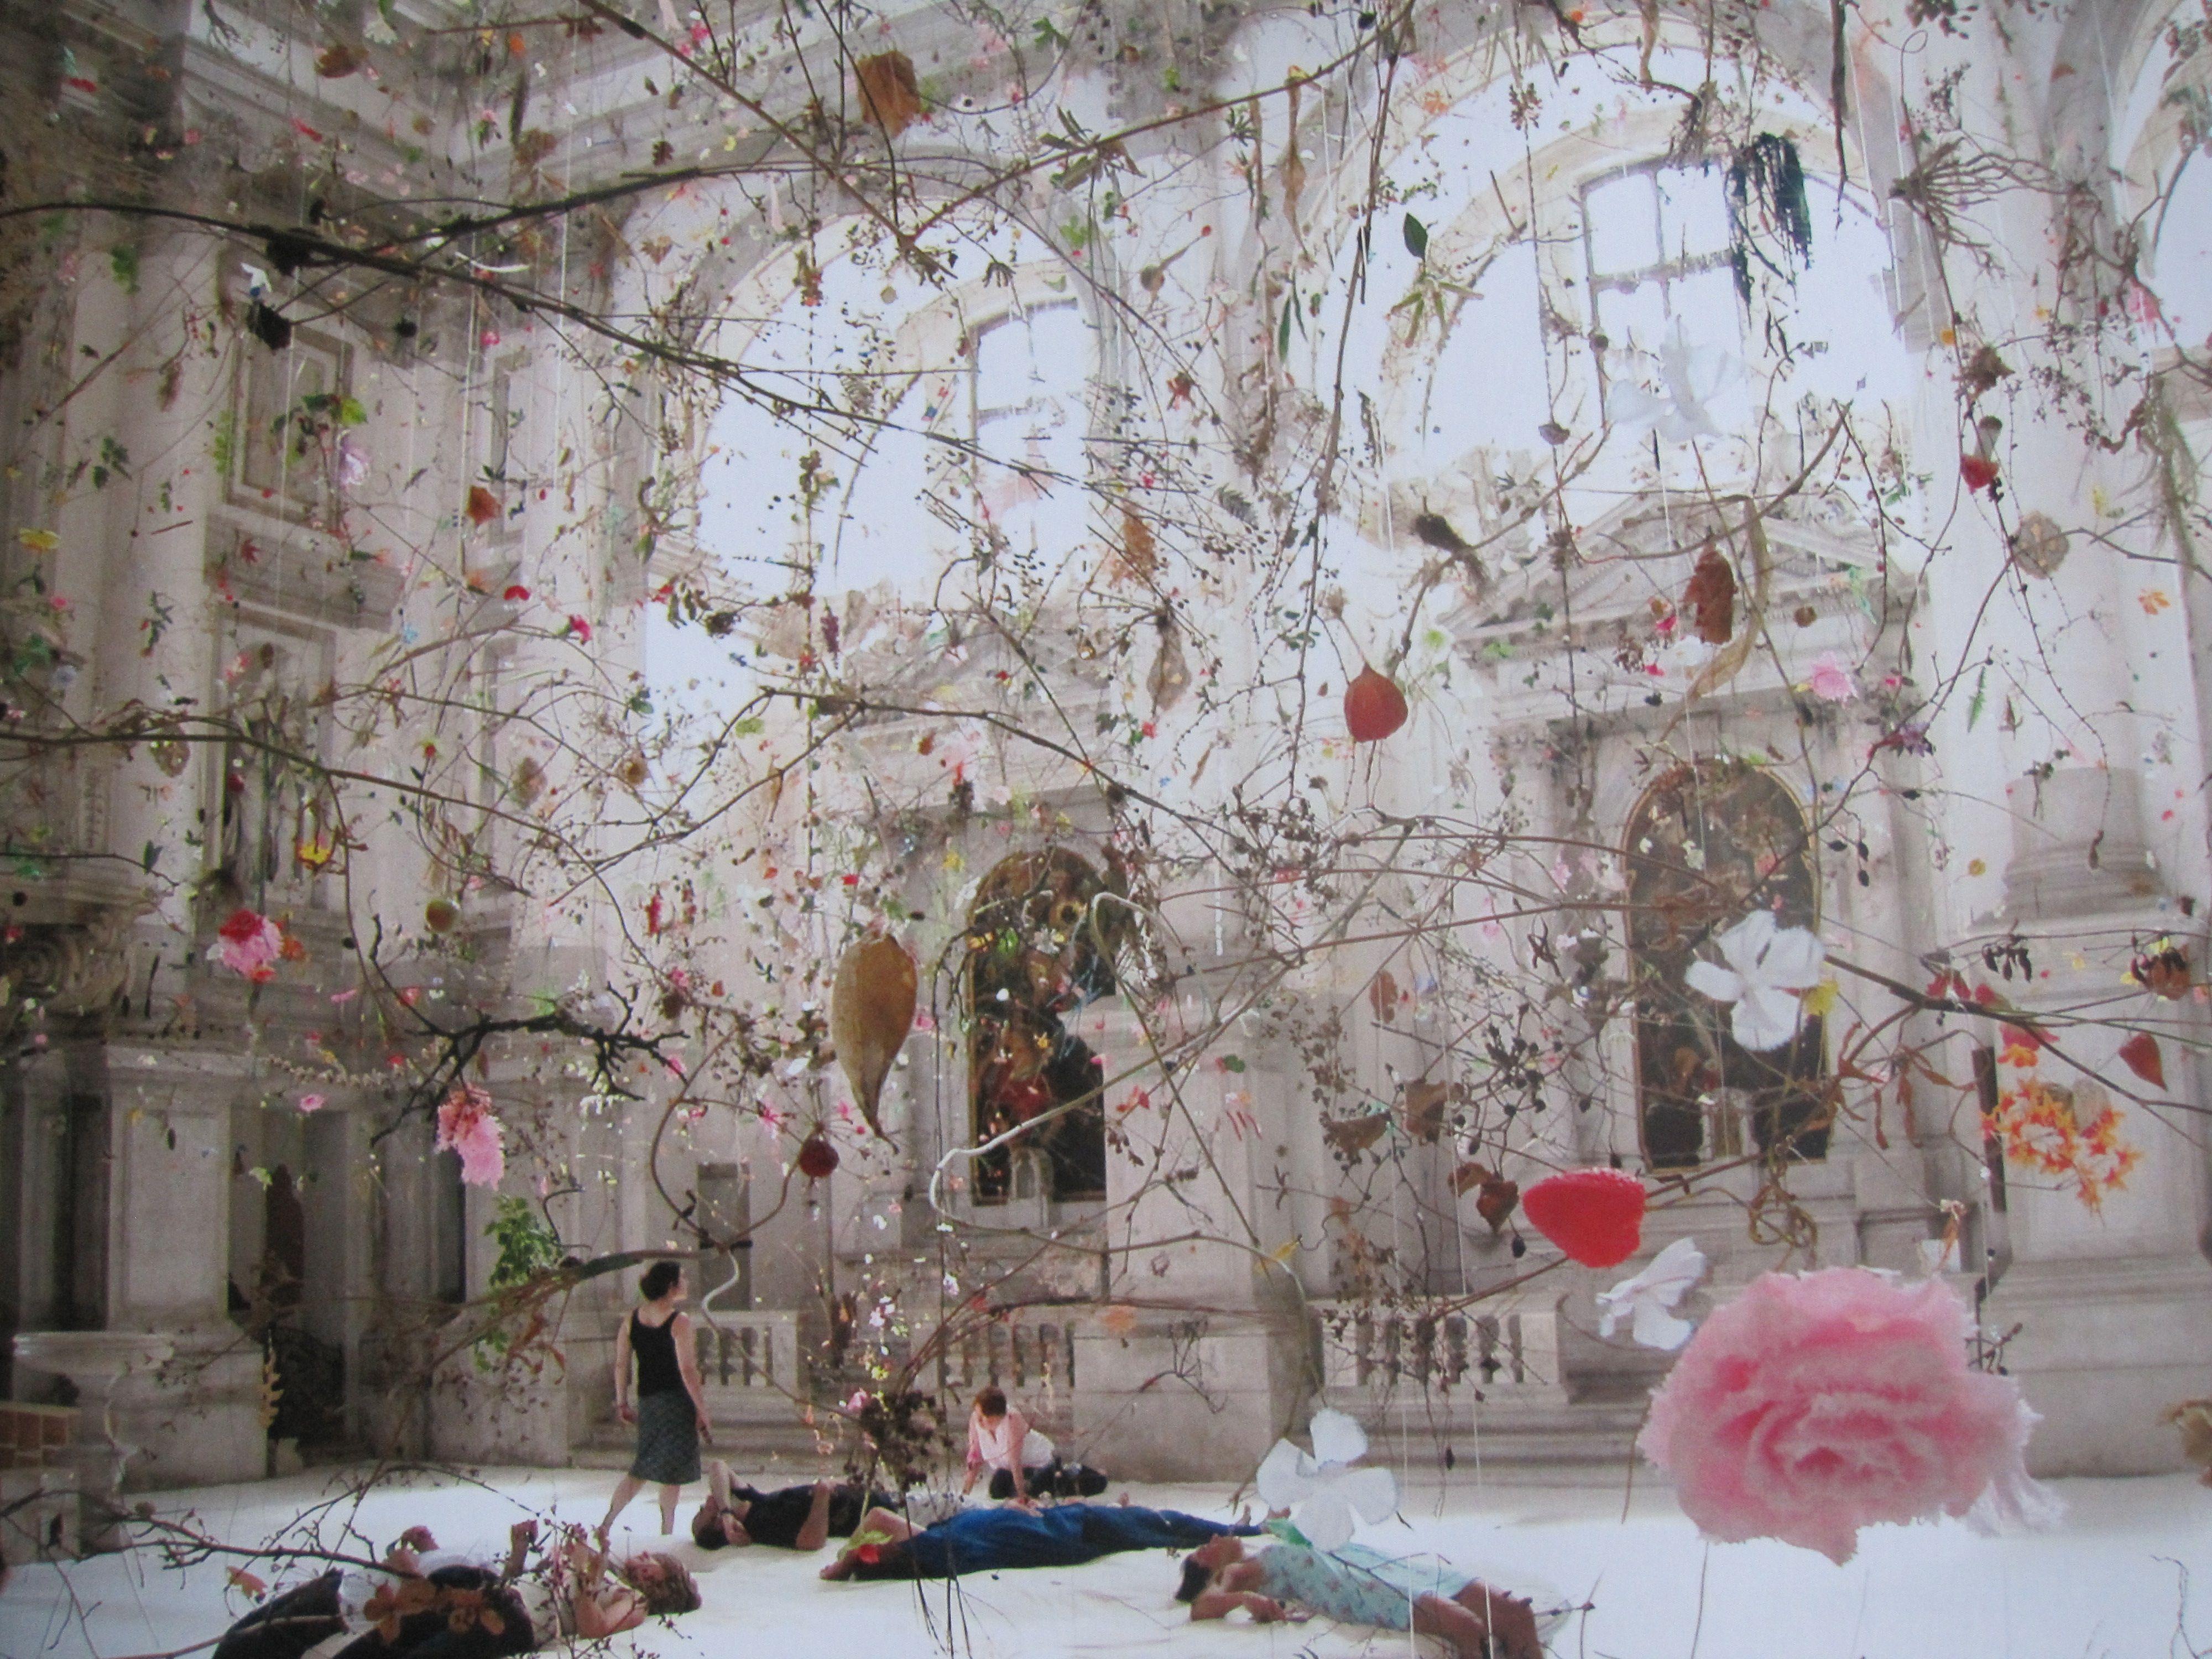 Gerda Steiner & Rg Lenzlinger 50th Venice Biennale